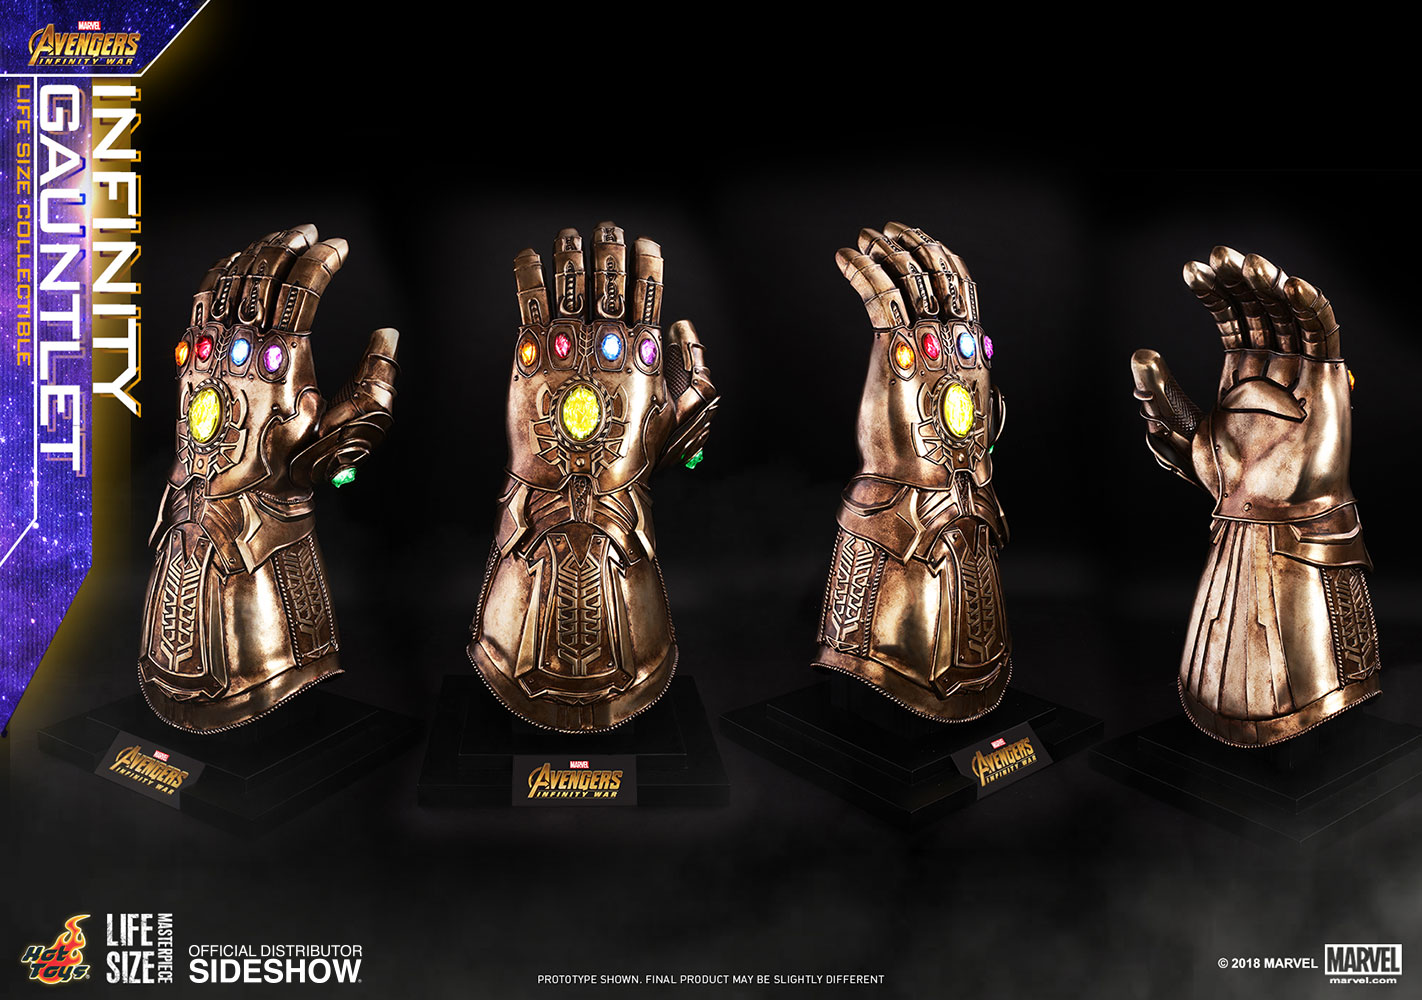 marvel-avengers-infinity-war-infinity-gauntlet-life-size-collectible-hot-toys-903428-04.jpg